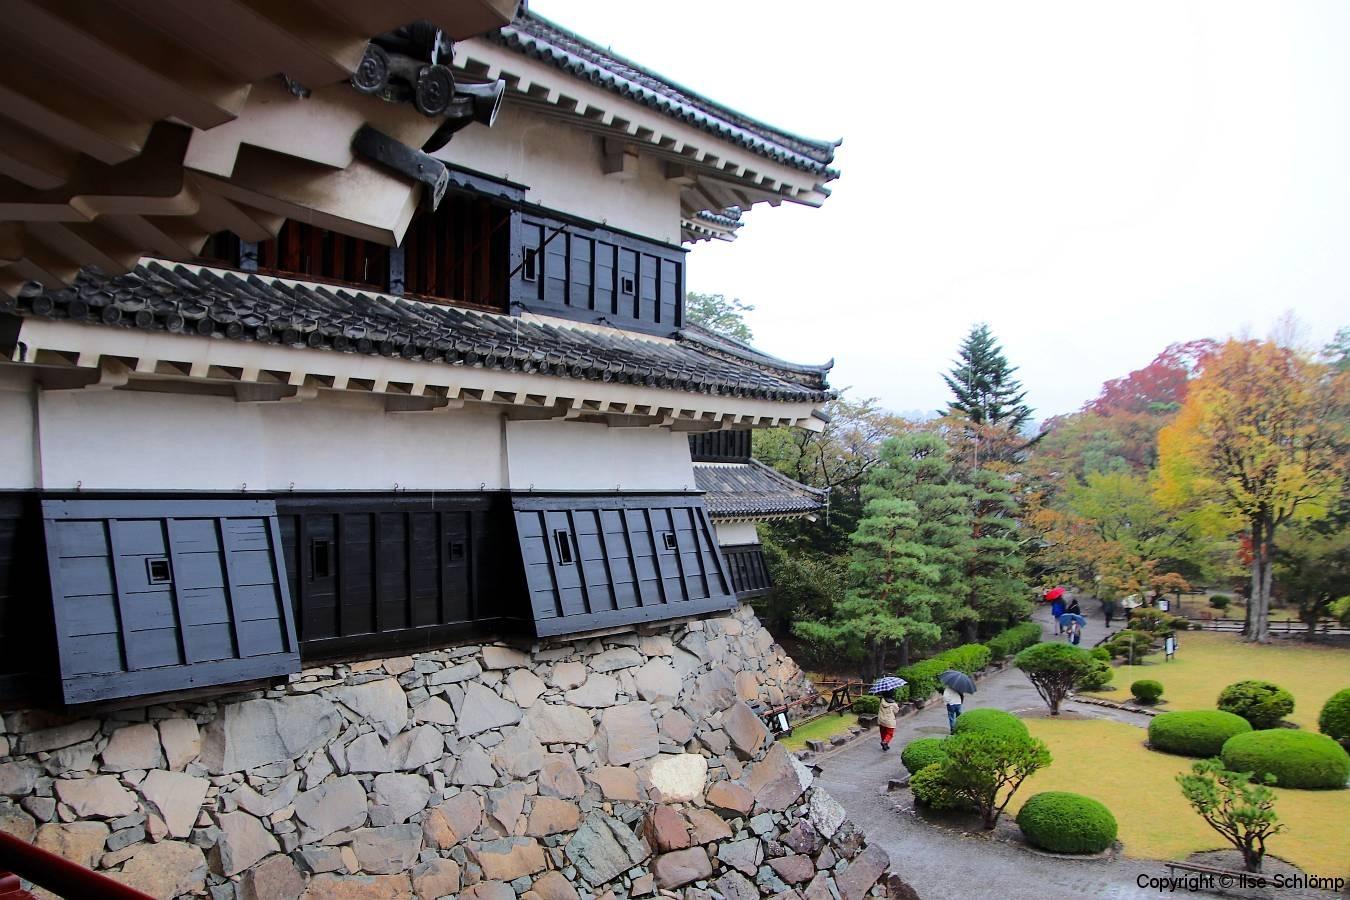 Japan, Matsumoto, Schwarze Krähenburg